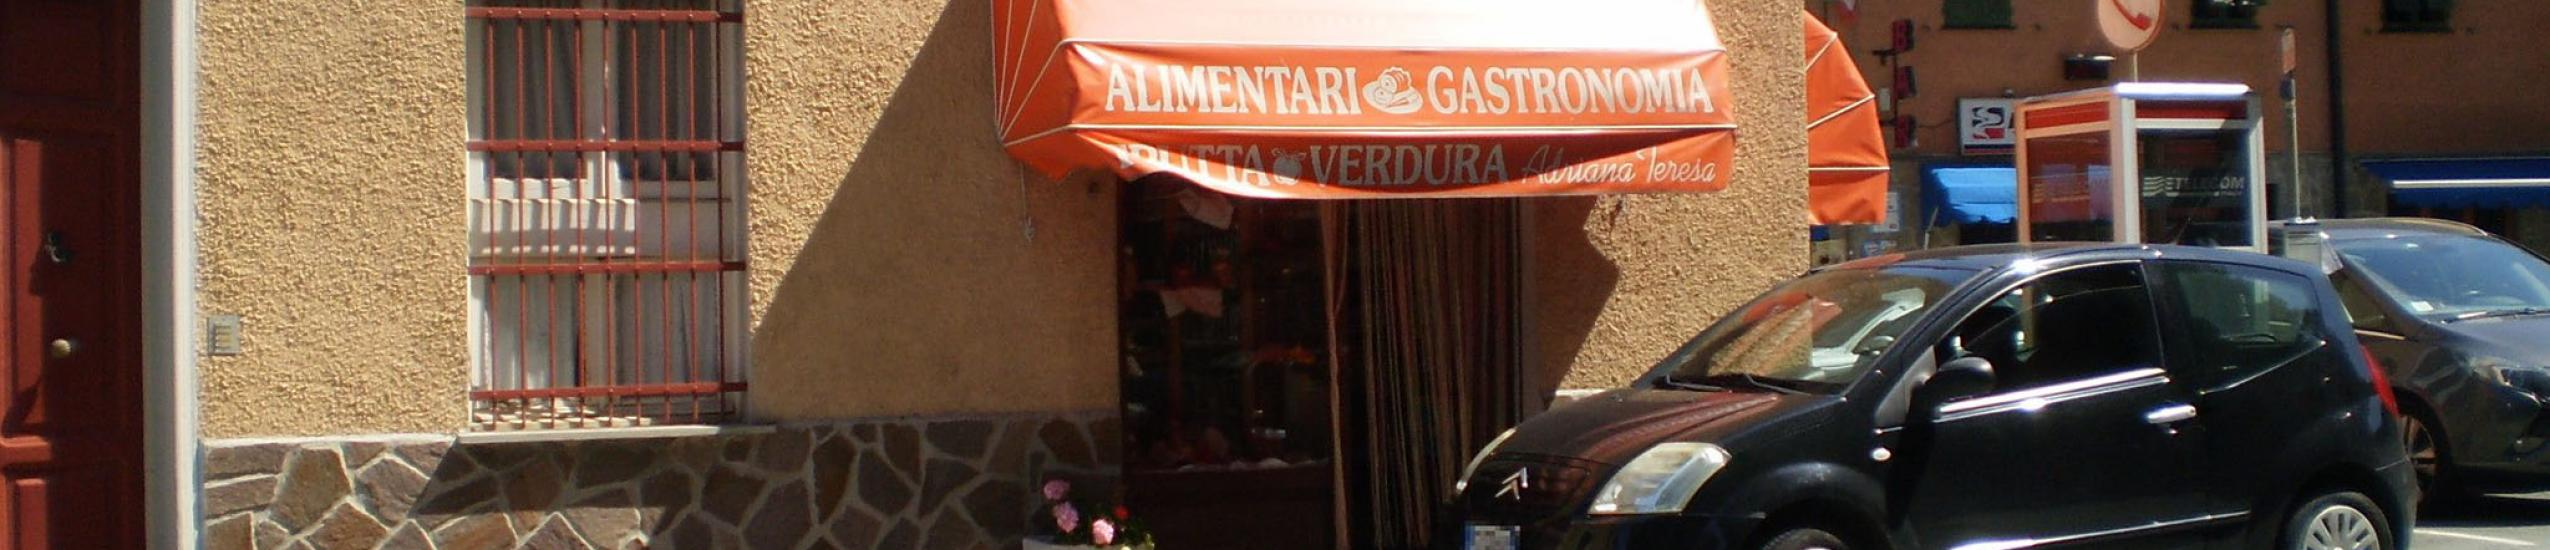 "Alimentari gastronomia ""Adriana Teresa"""